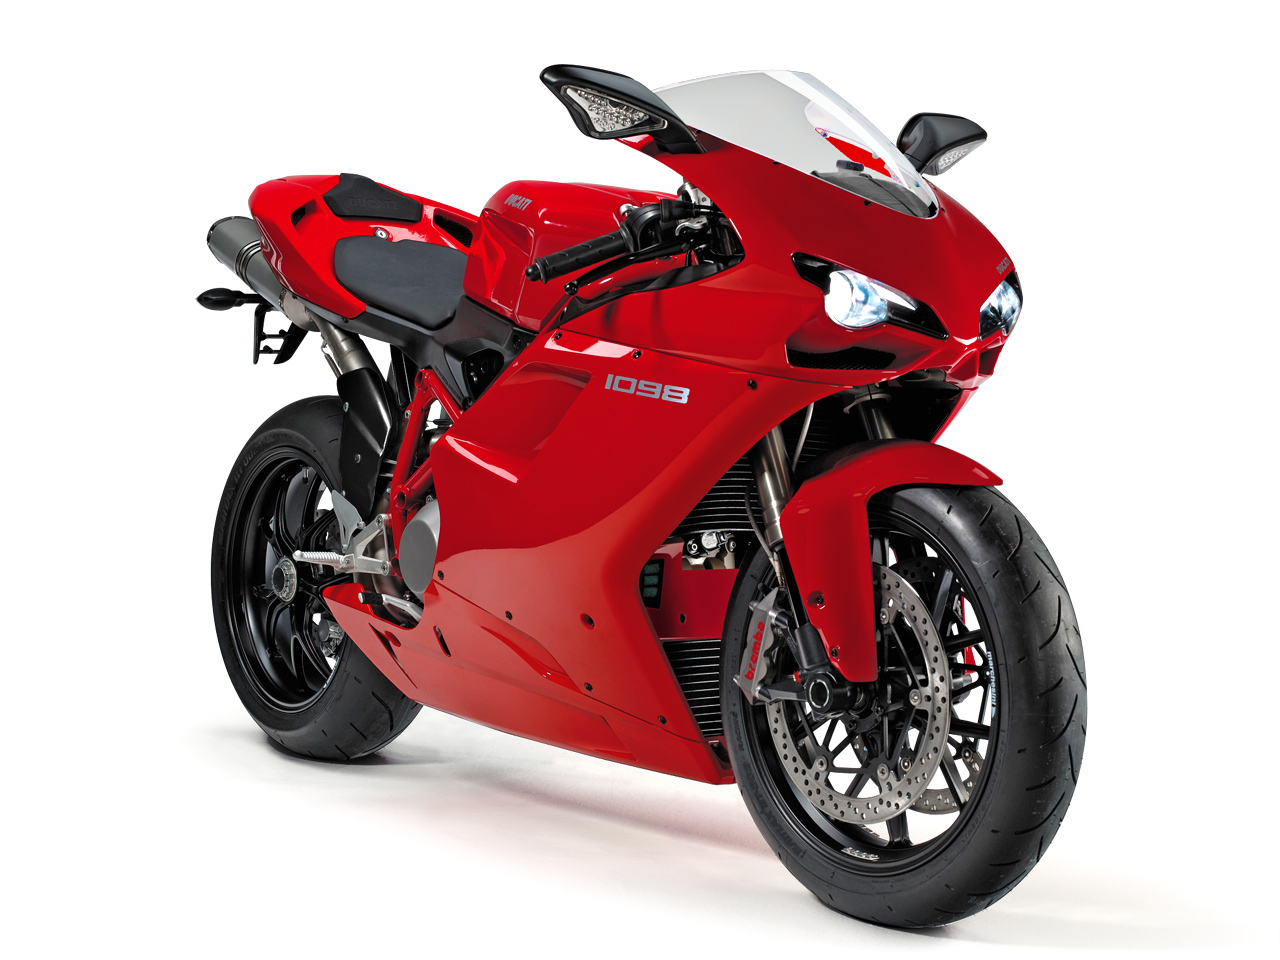 Motorcycle Wallpaper Ducati 1098 Wallpaper 1280x960